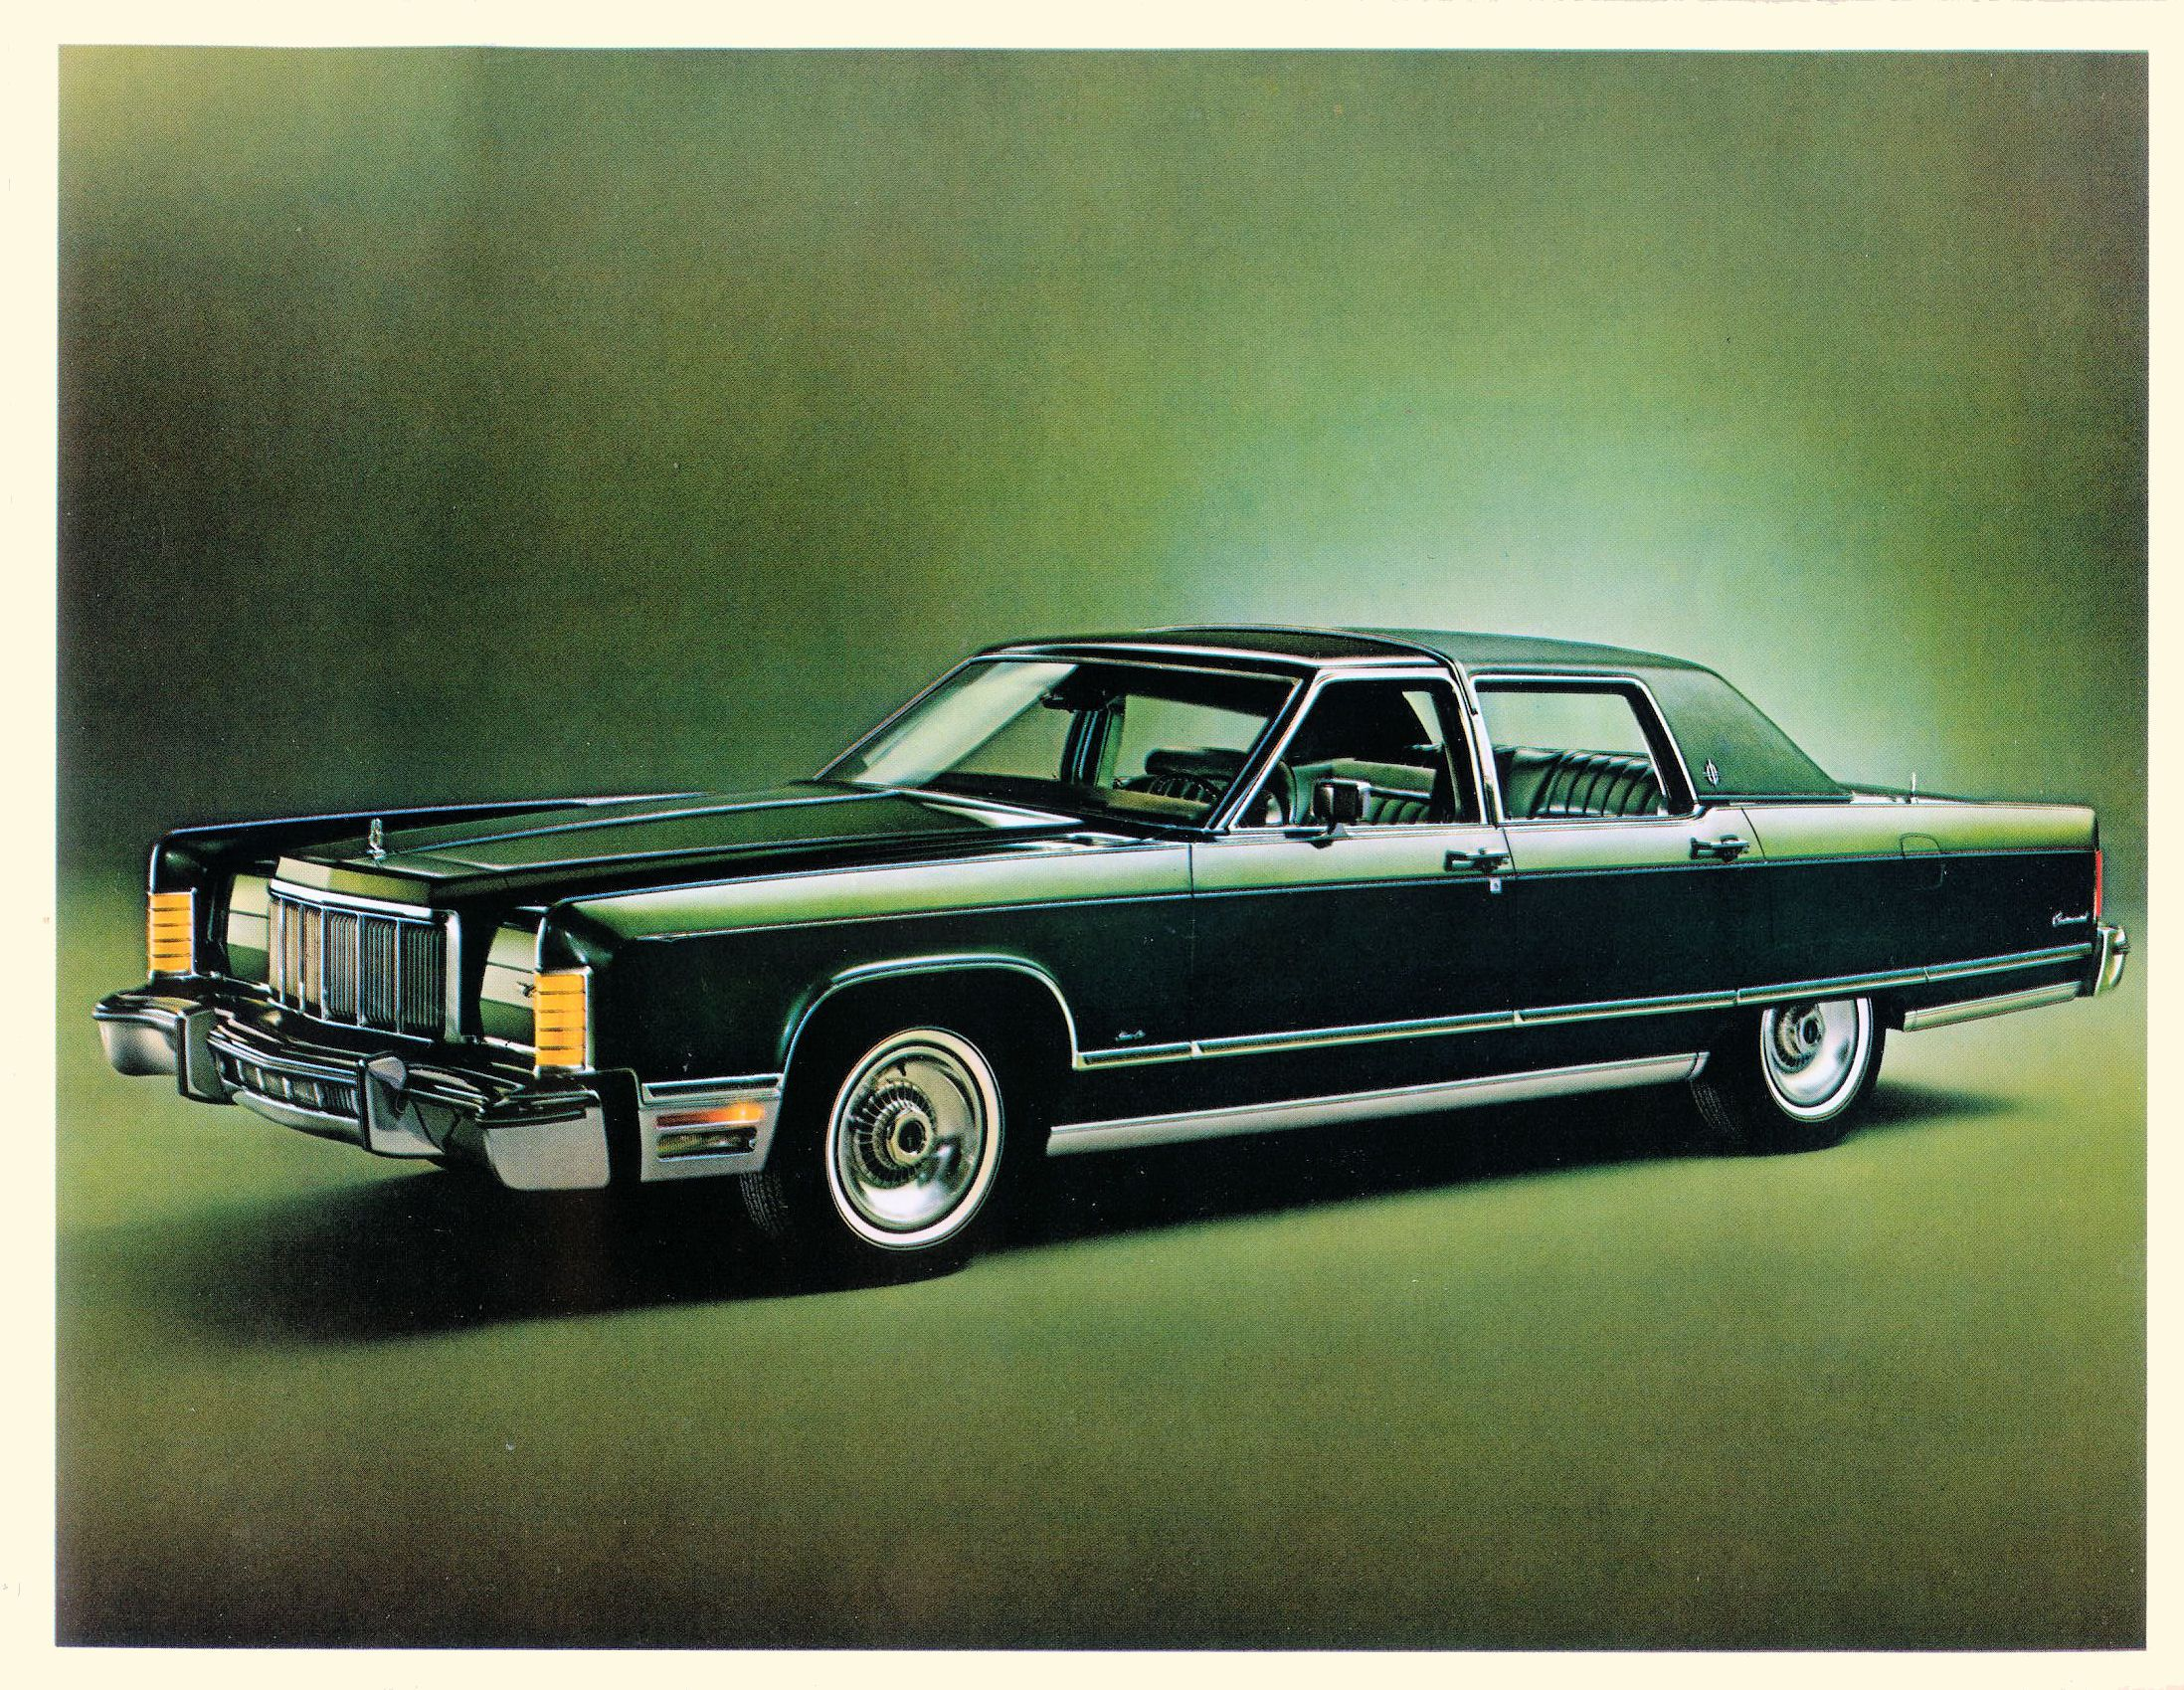 1976 Lincoln Continental03